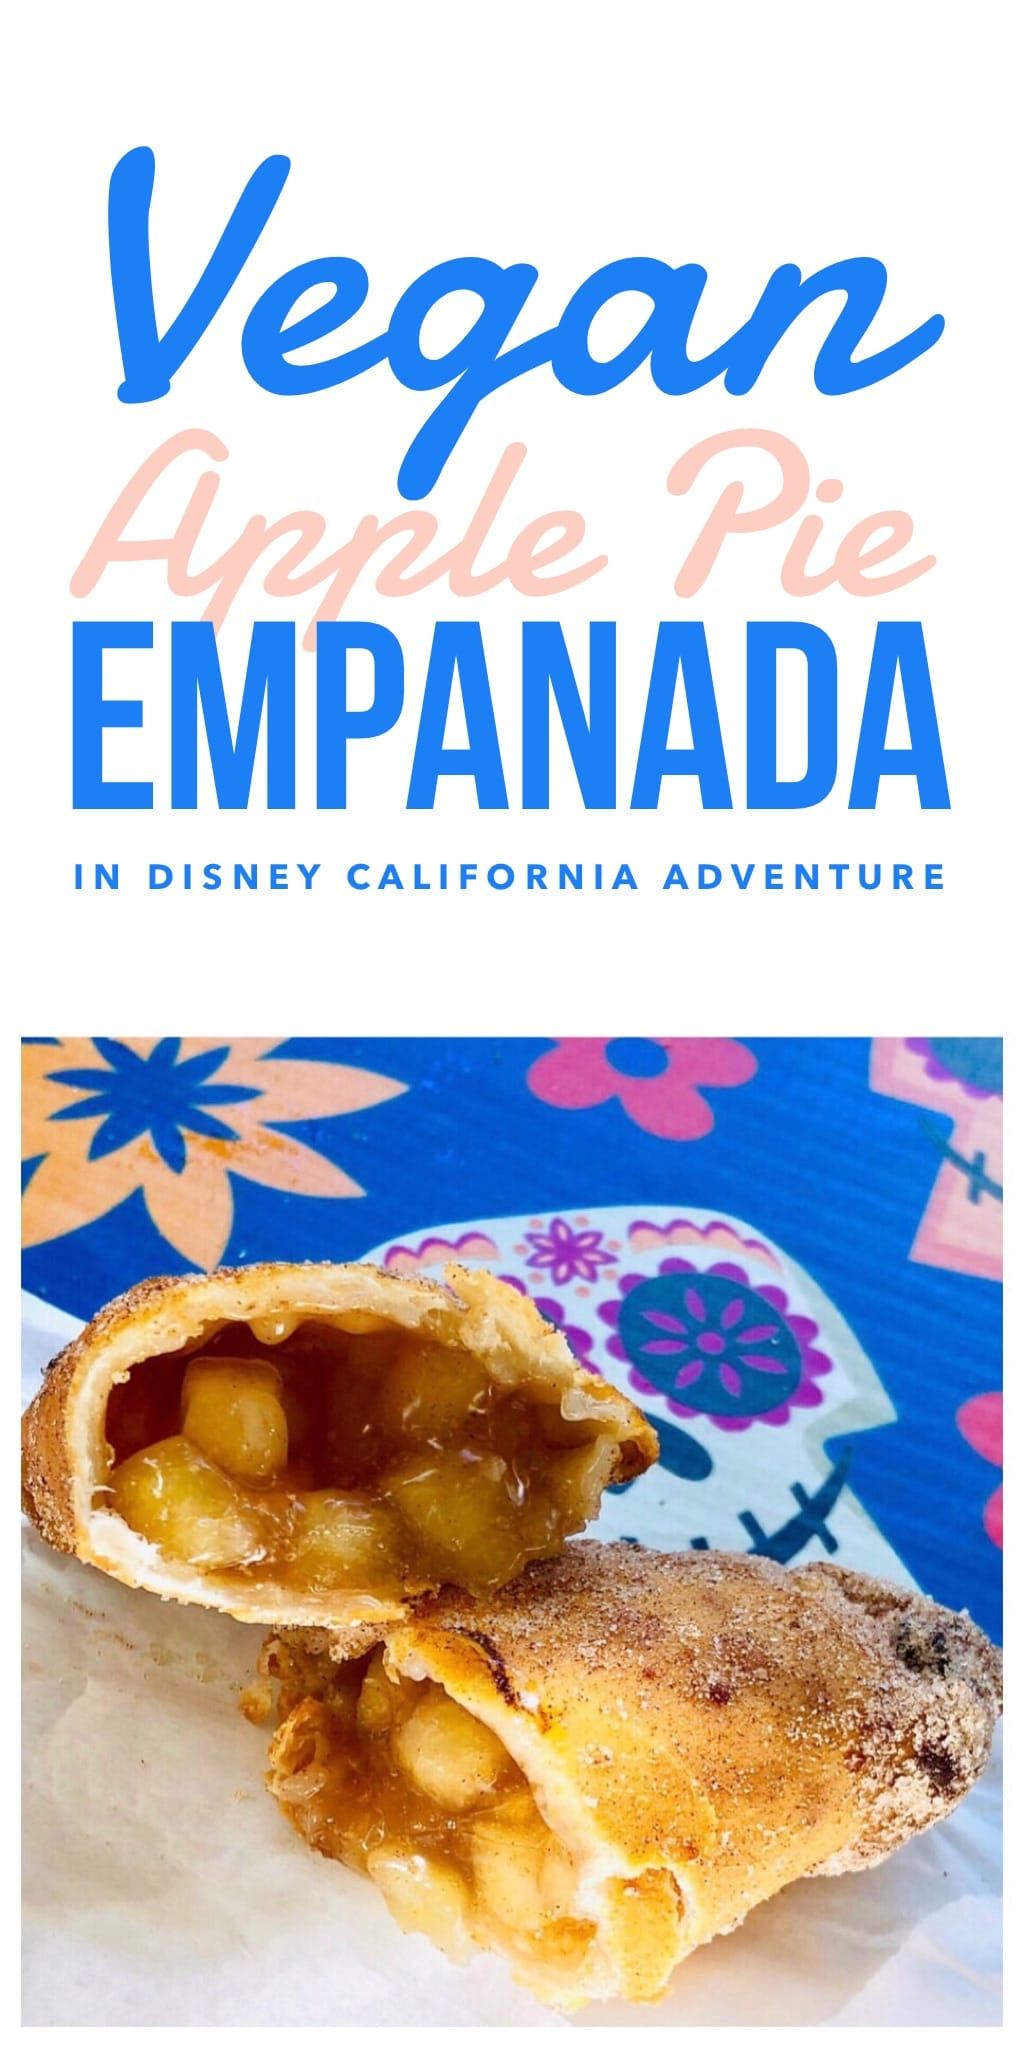 Vegan Apple Pie Empanada in Disney California Adventure at the Disneyland Resort